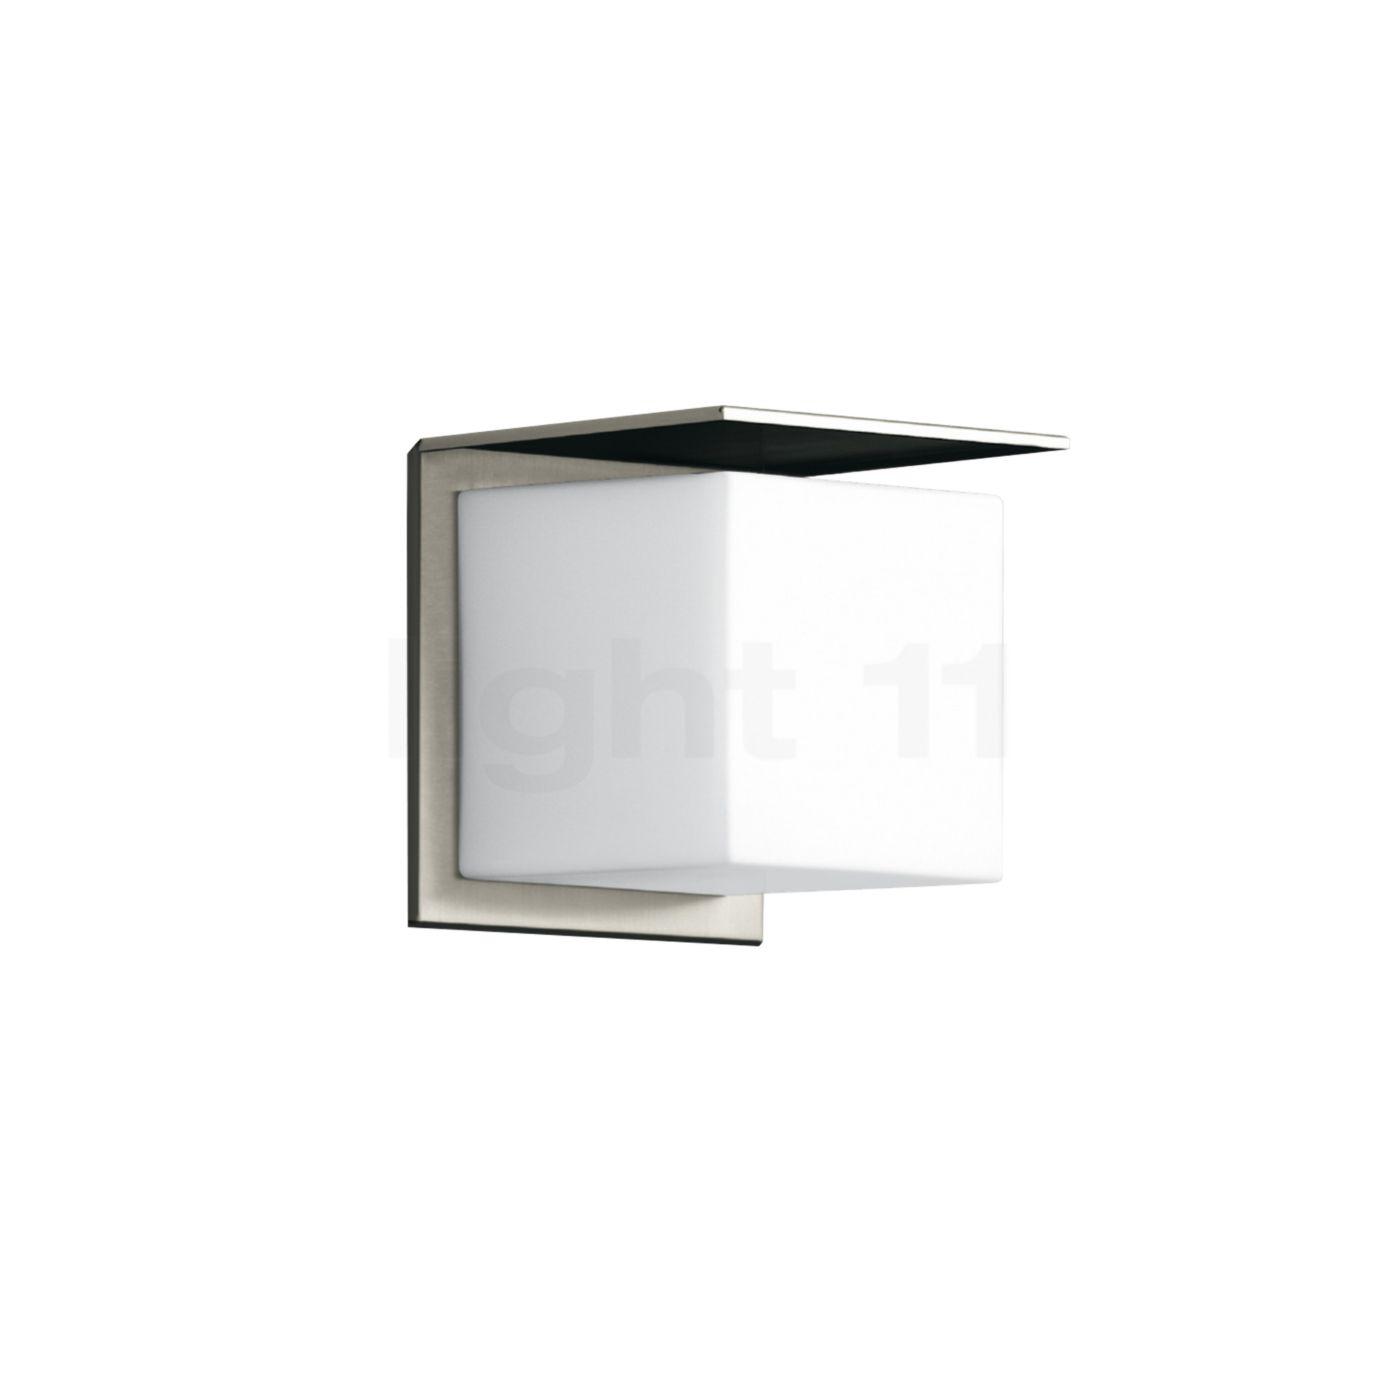 bega 44007 wandleuchte halo kaufen bei. Black Bedroom Furniture Sets. Home Design Ideas